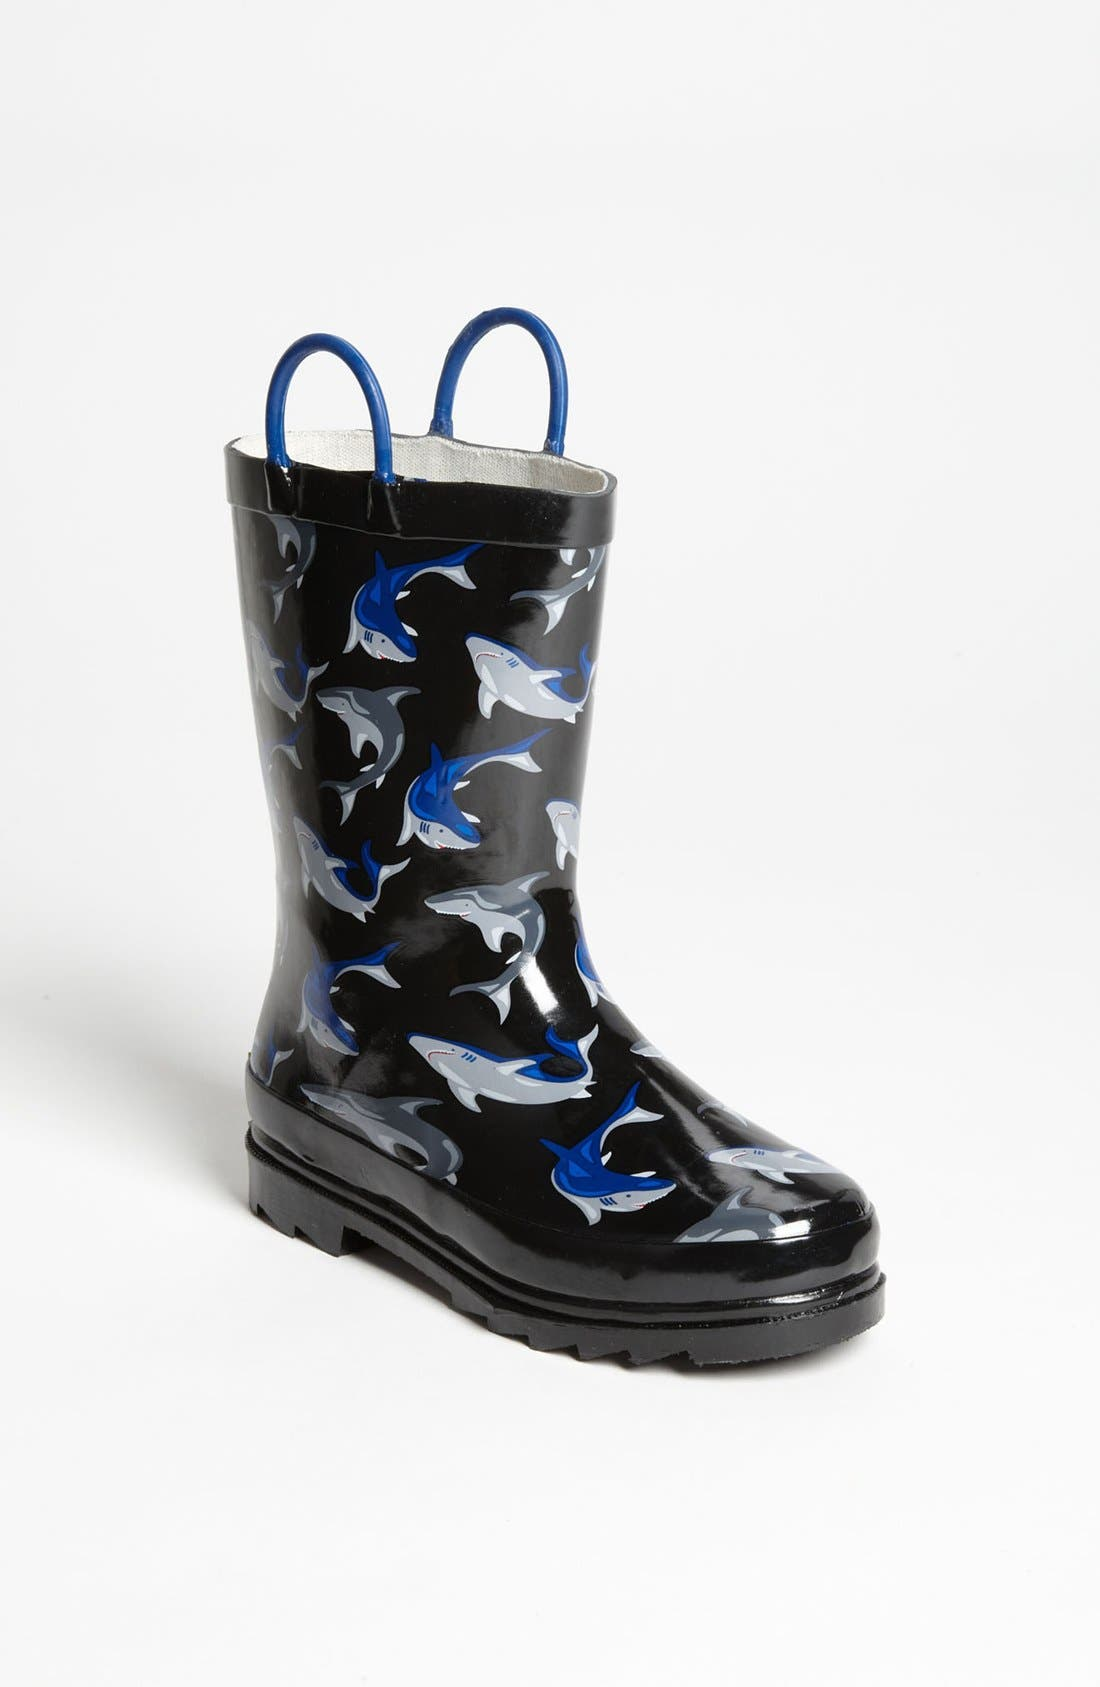 Main Image - Western Chief 'Shark City' Rain Boot (Toddler & Little Kid)